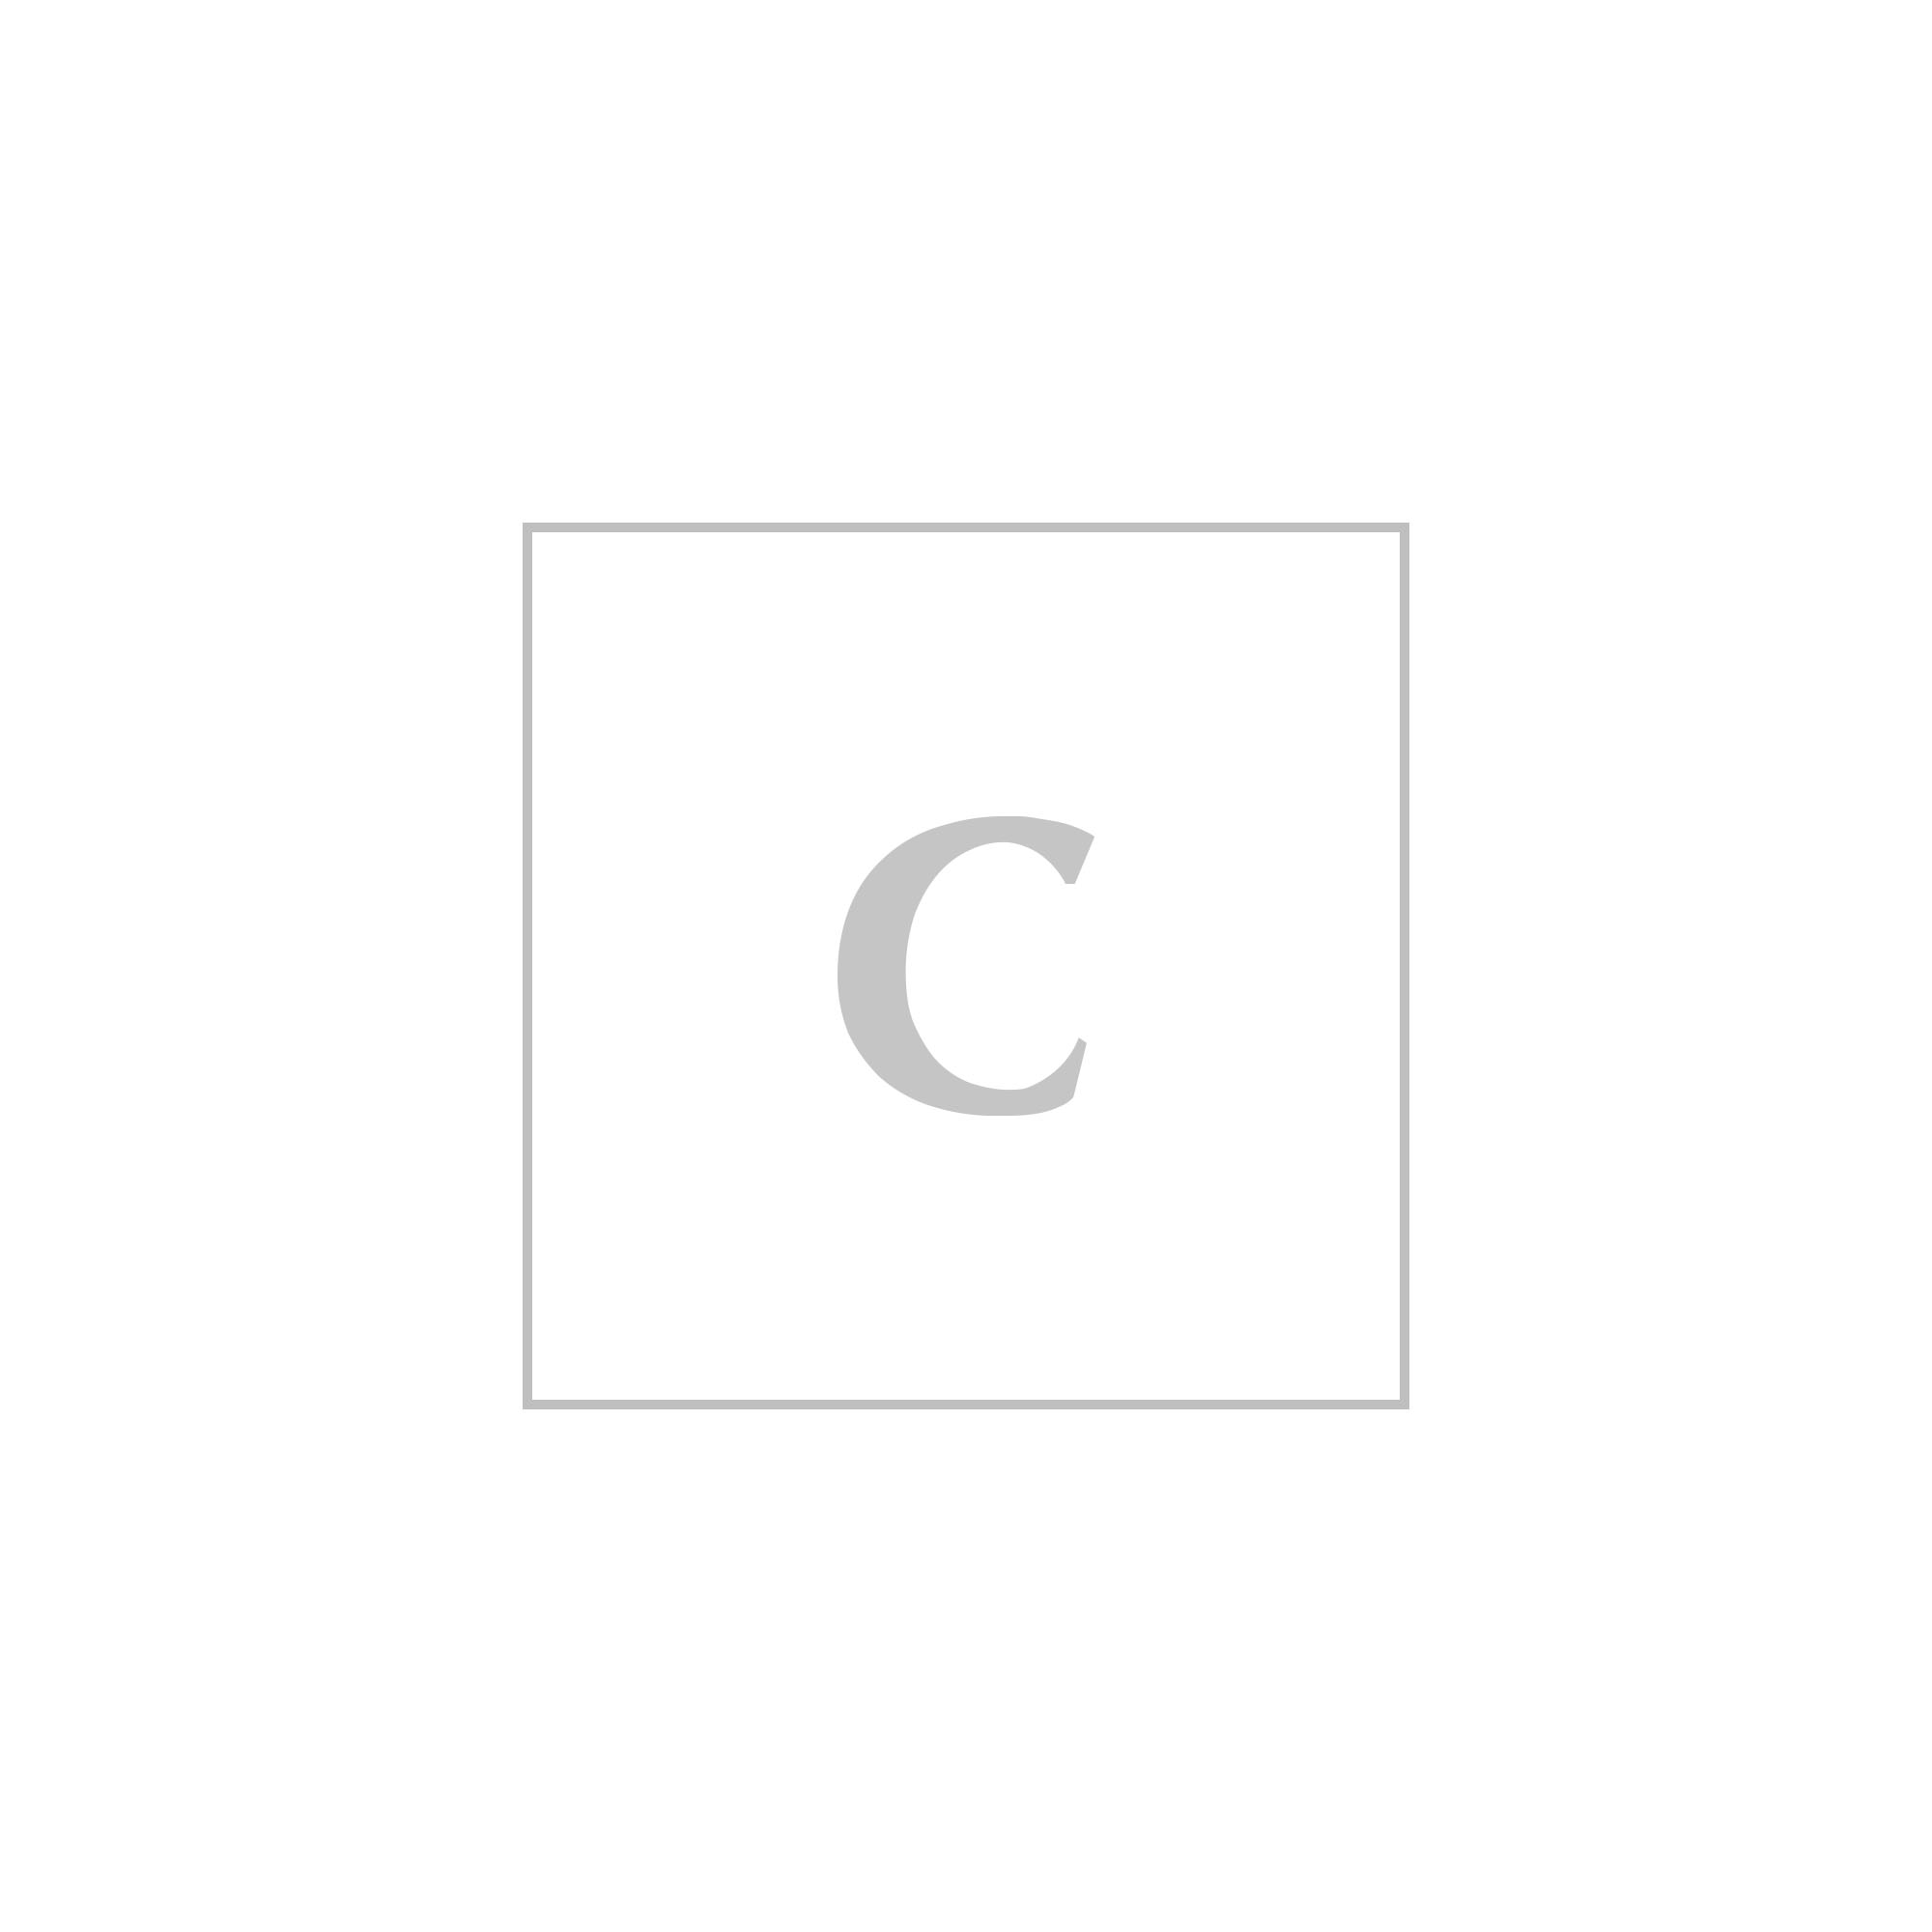 Stella mccartney blusa small poppy cady print